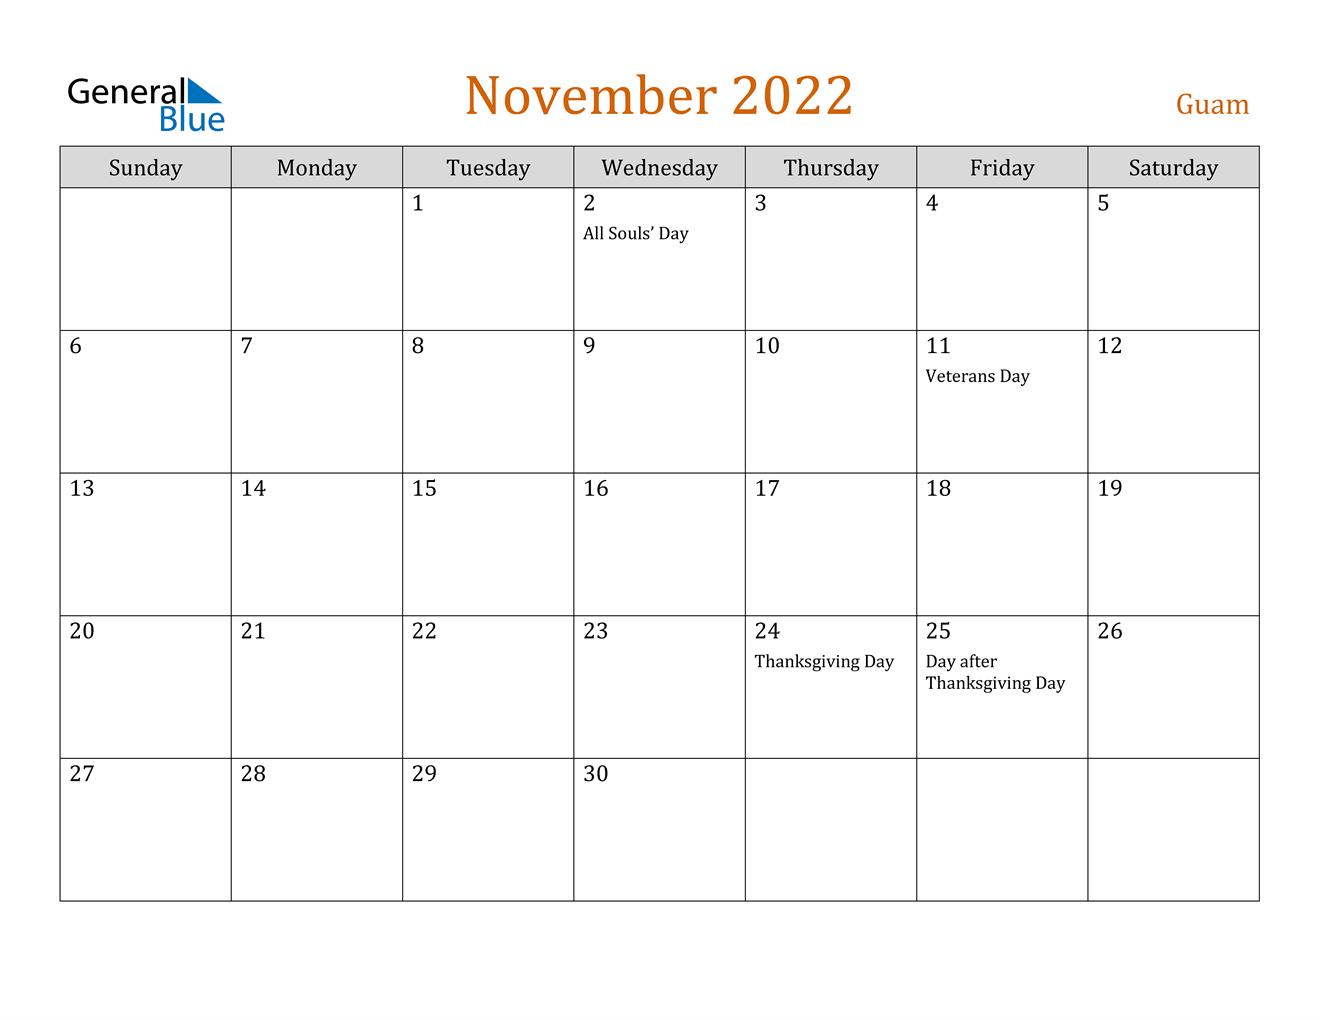 November 2022 Calendar - Guam